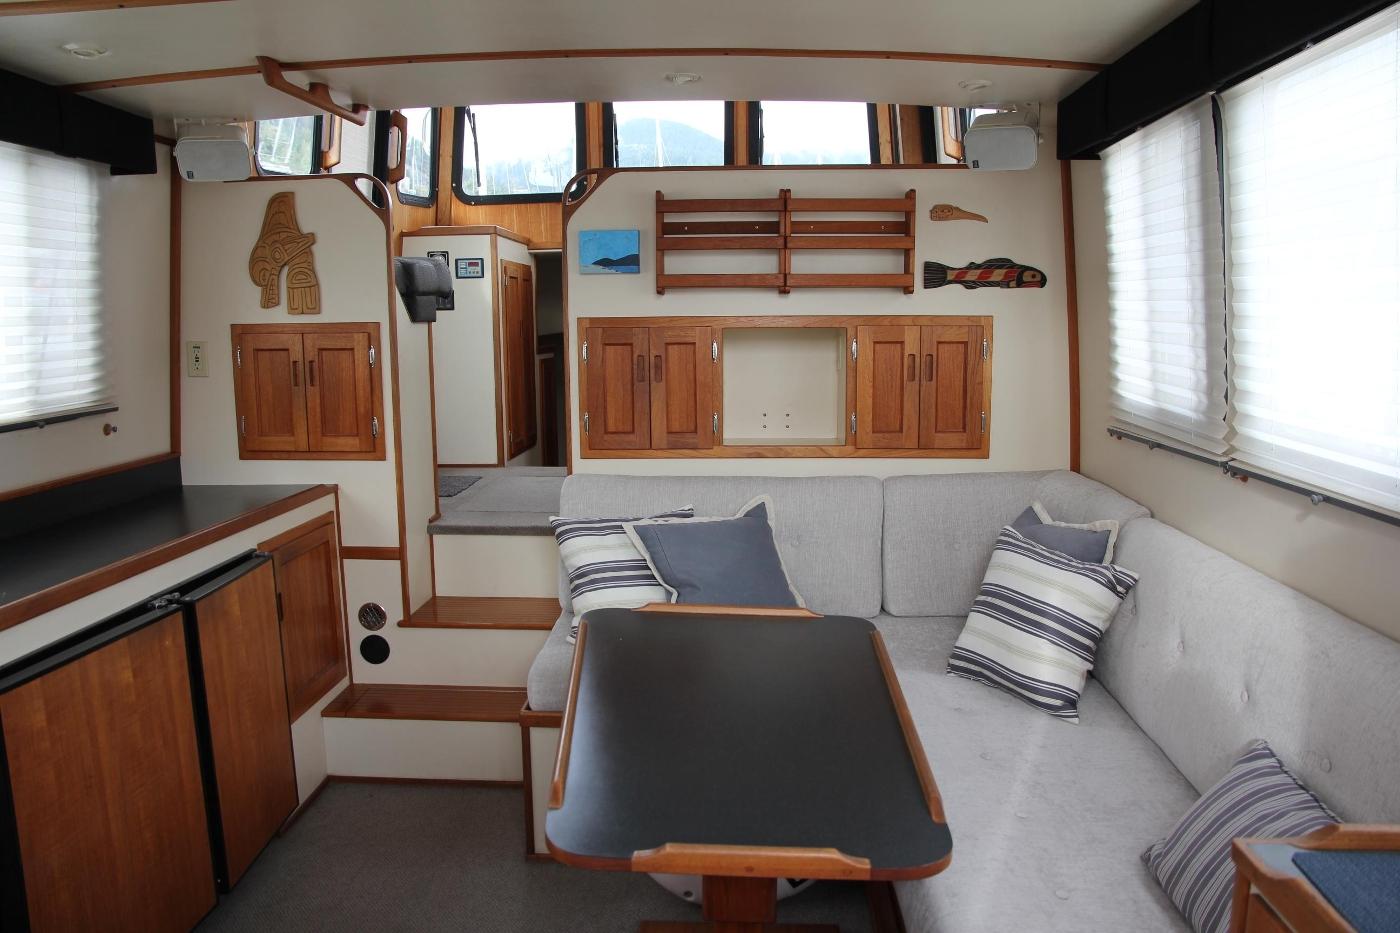 2001 Nordic Tugs 32 Pilothouse, Salon Looking Forward